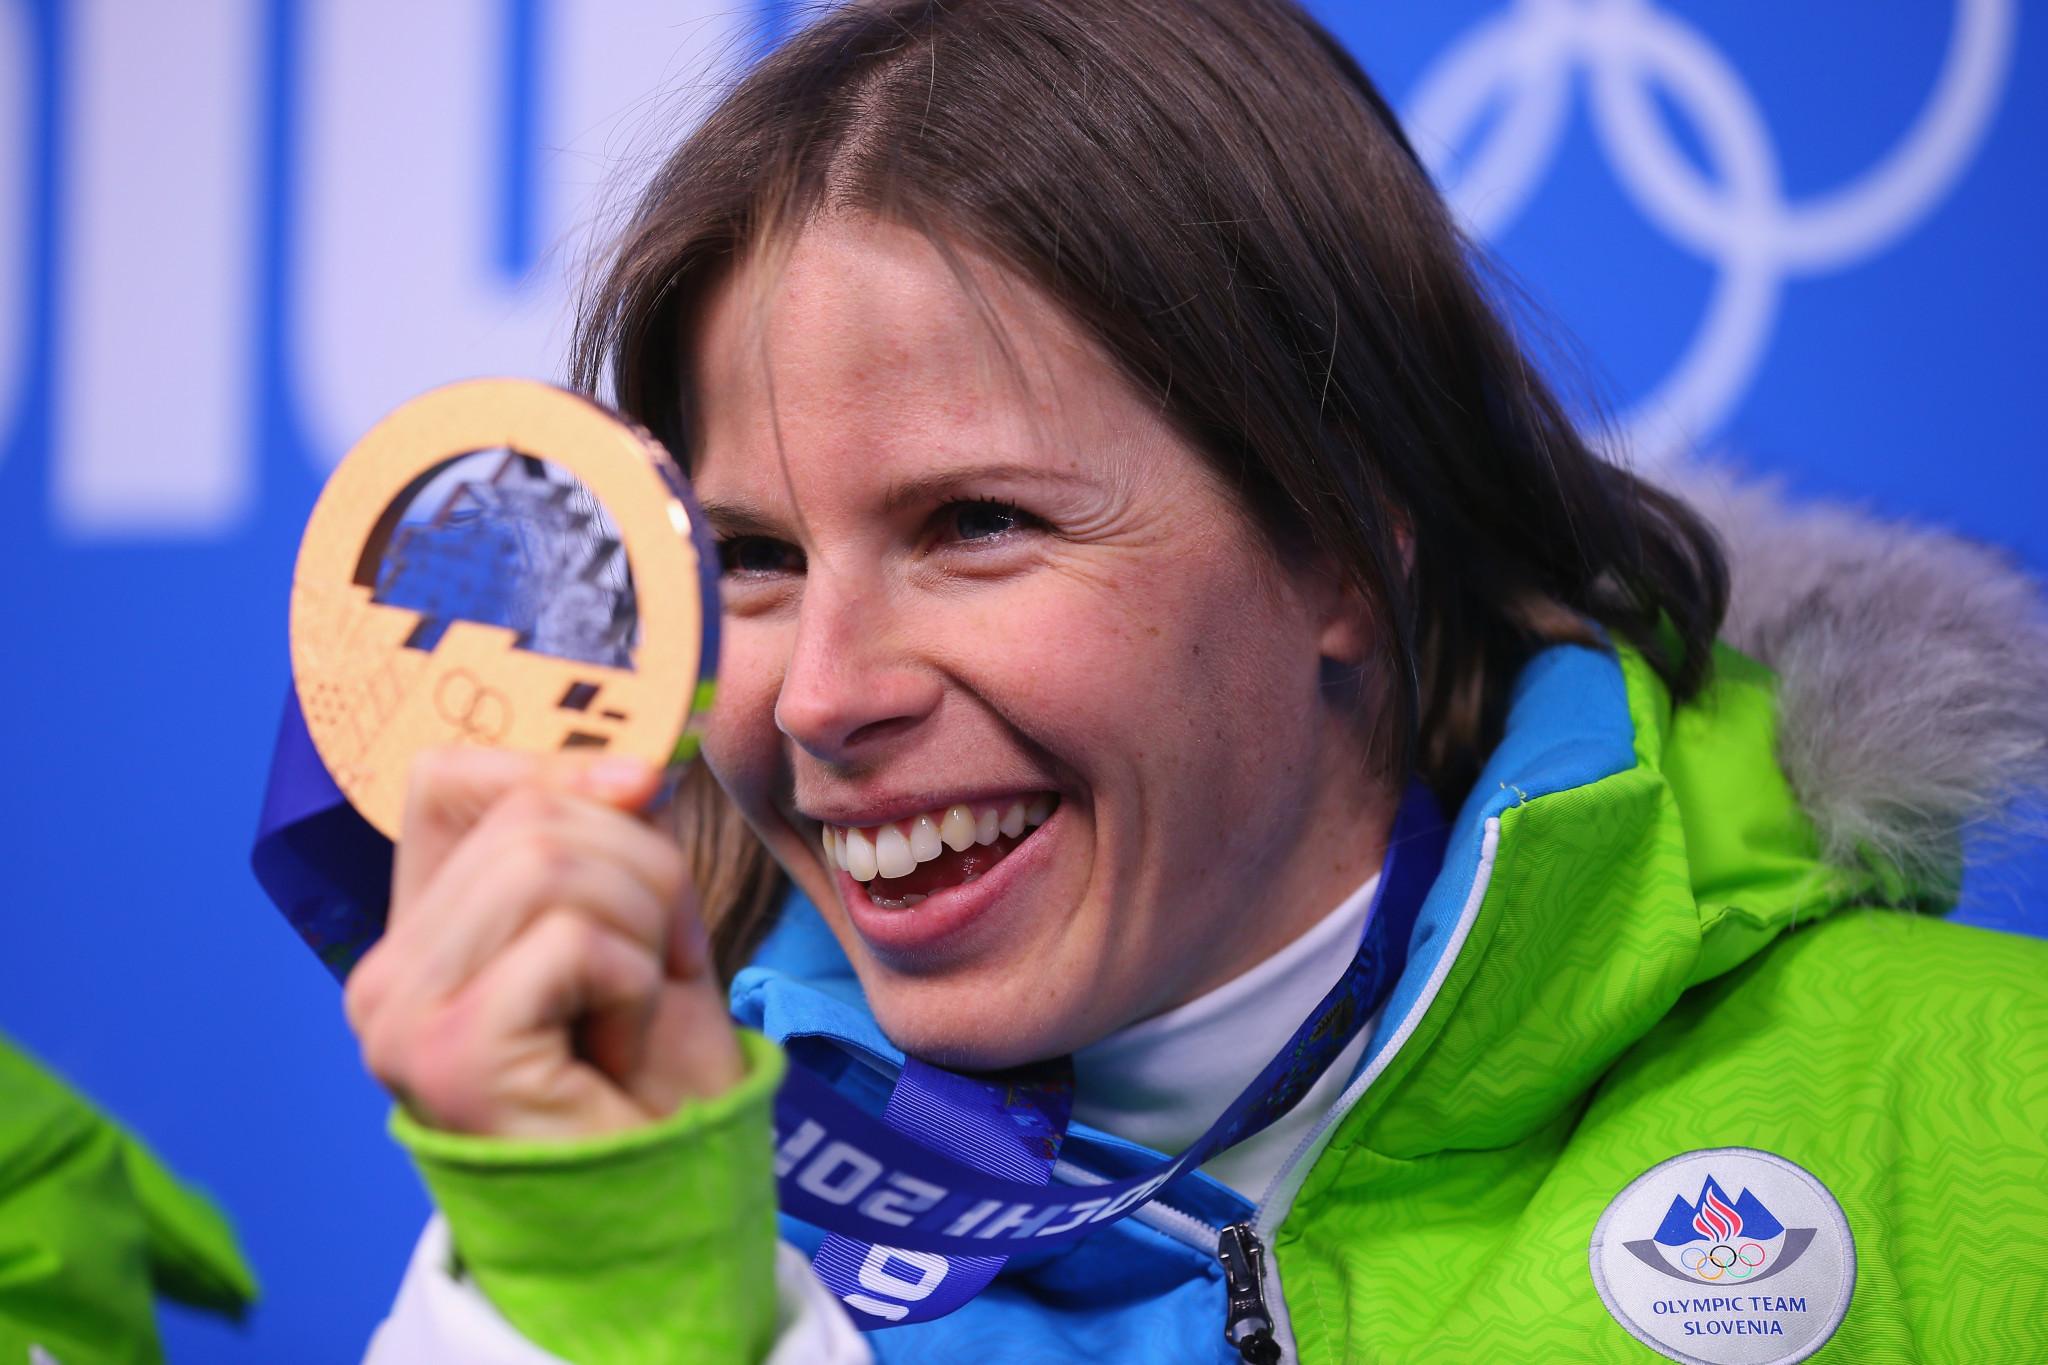 Winter Olympic medallist Fabjan retires from cross-country skiing